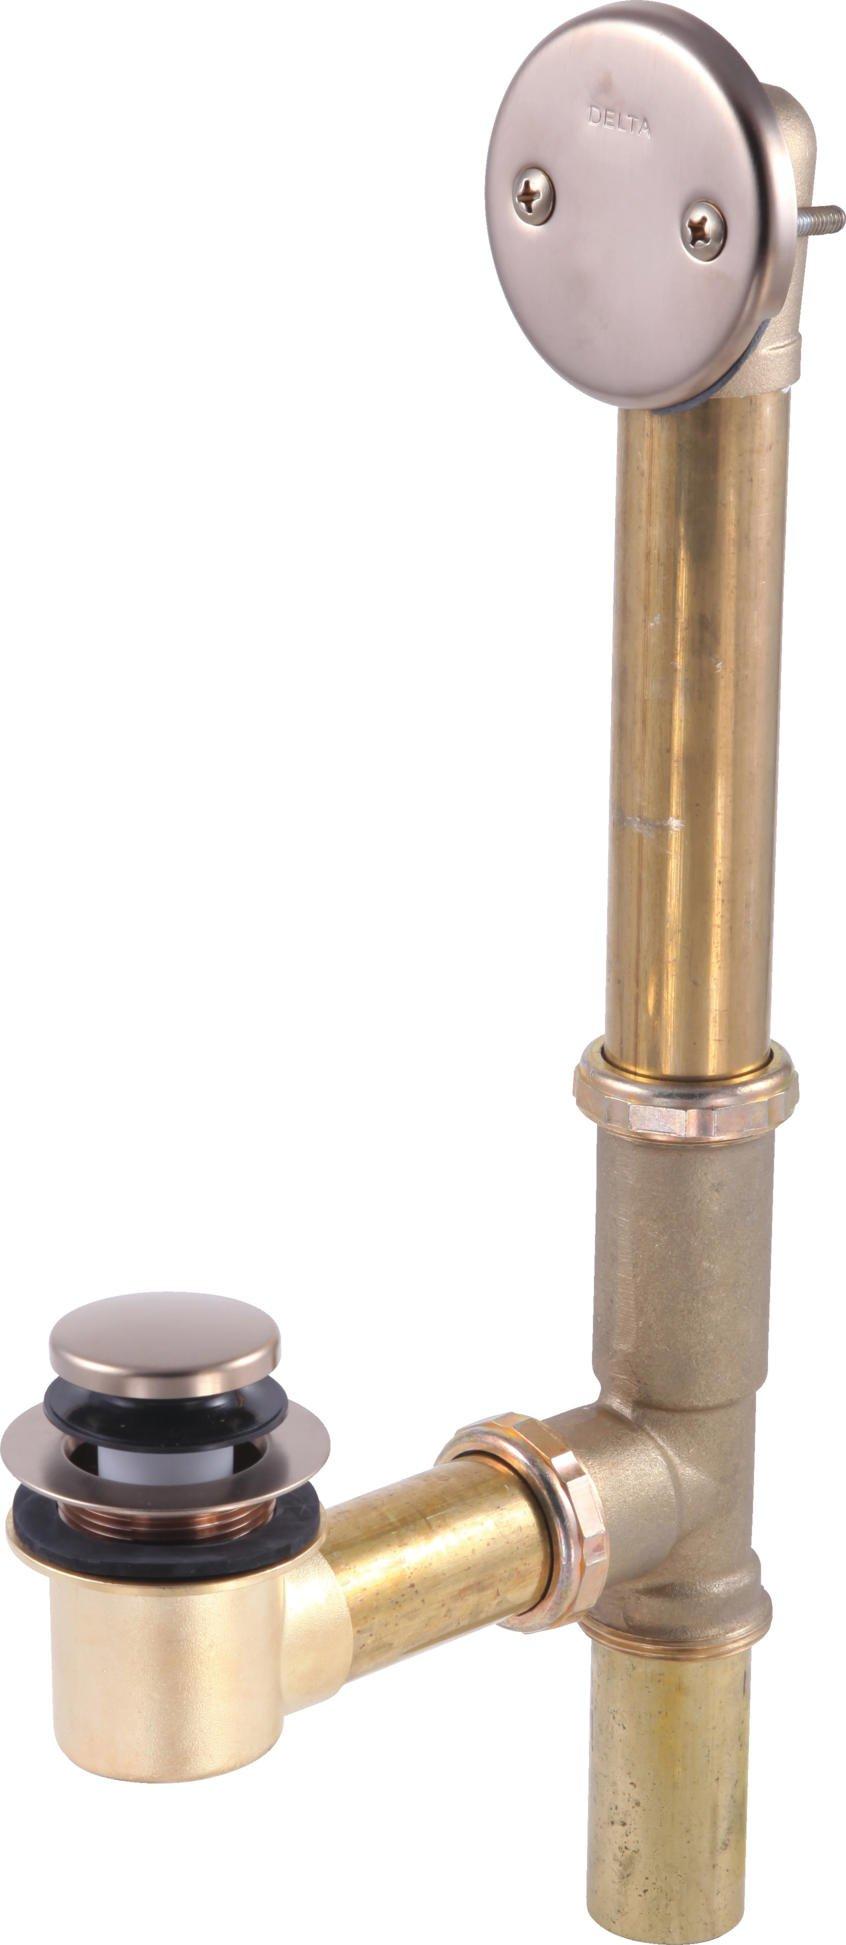 Delta RP693CZ Bath Waste Assembly, Champagne Bronze